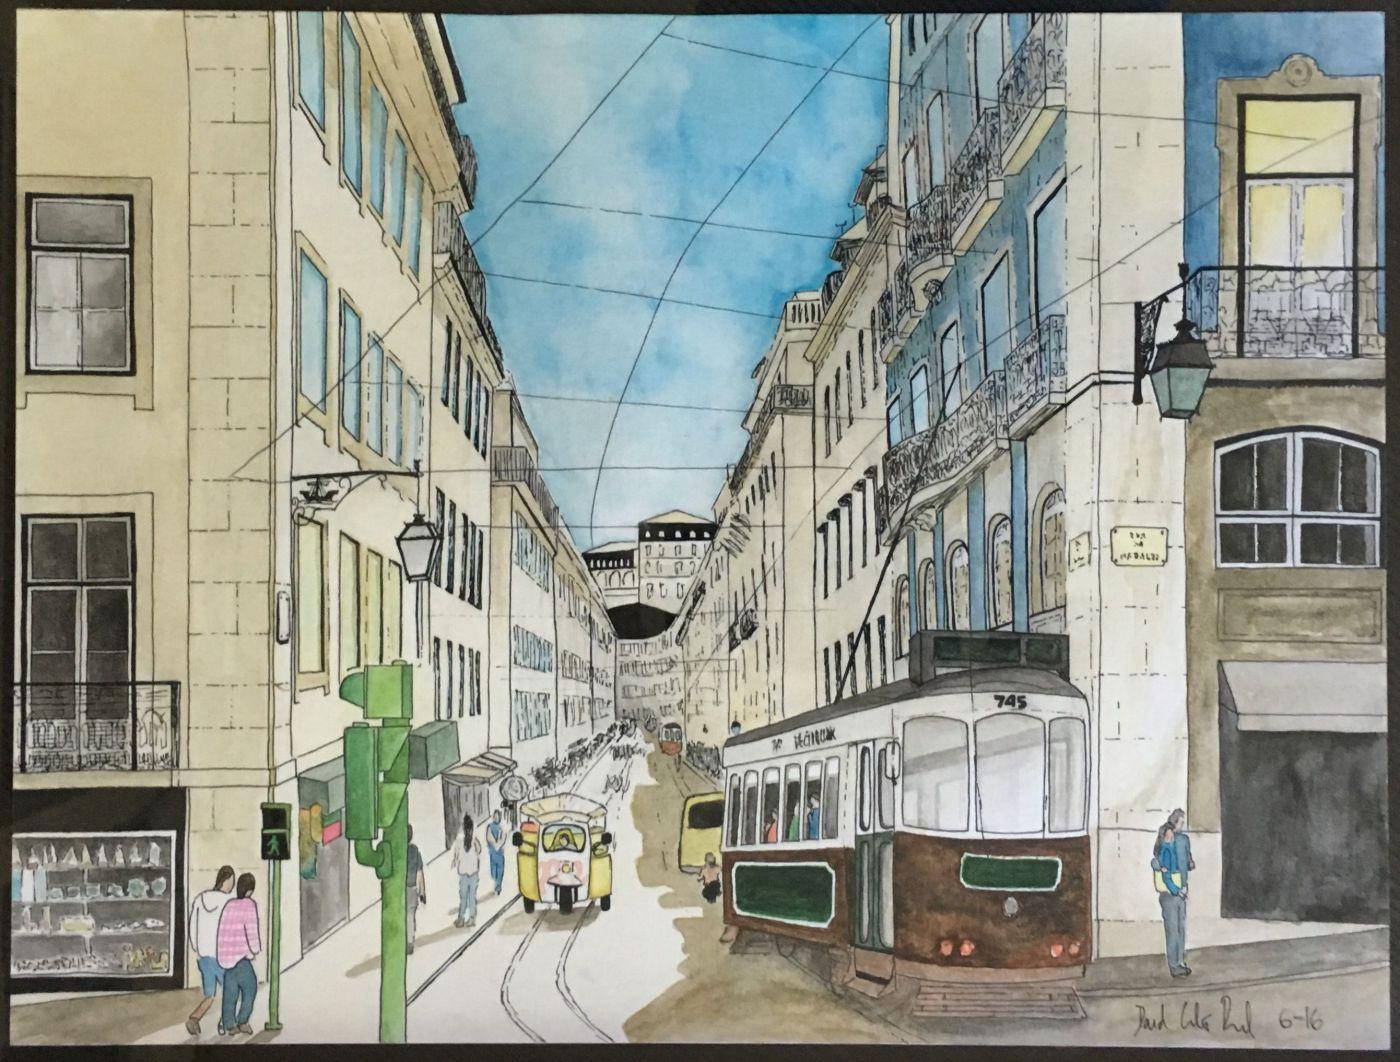 Doodlewash and watercolor by David Calderón Real of city street